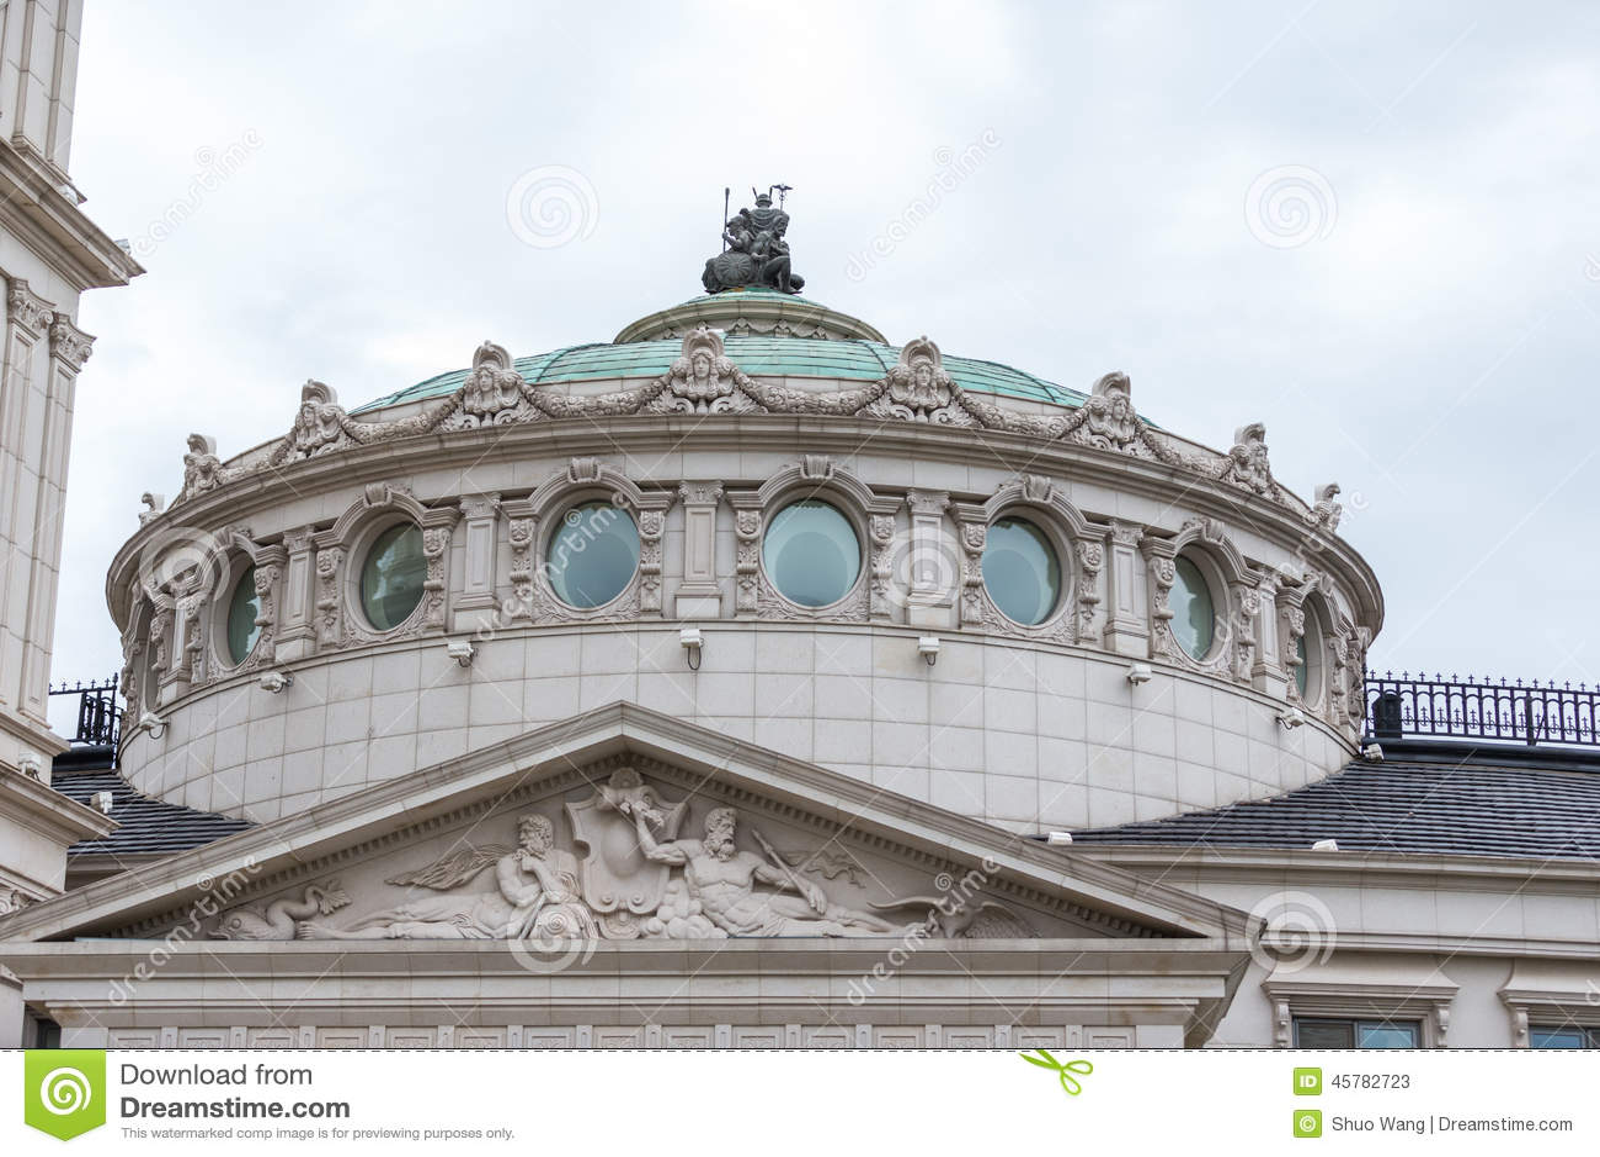 European Architecture Stock Photo - Image: 45782723